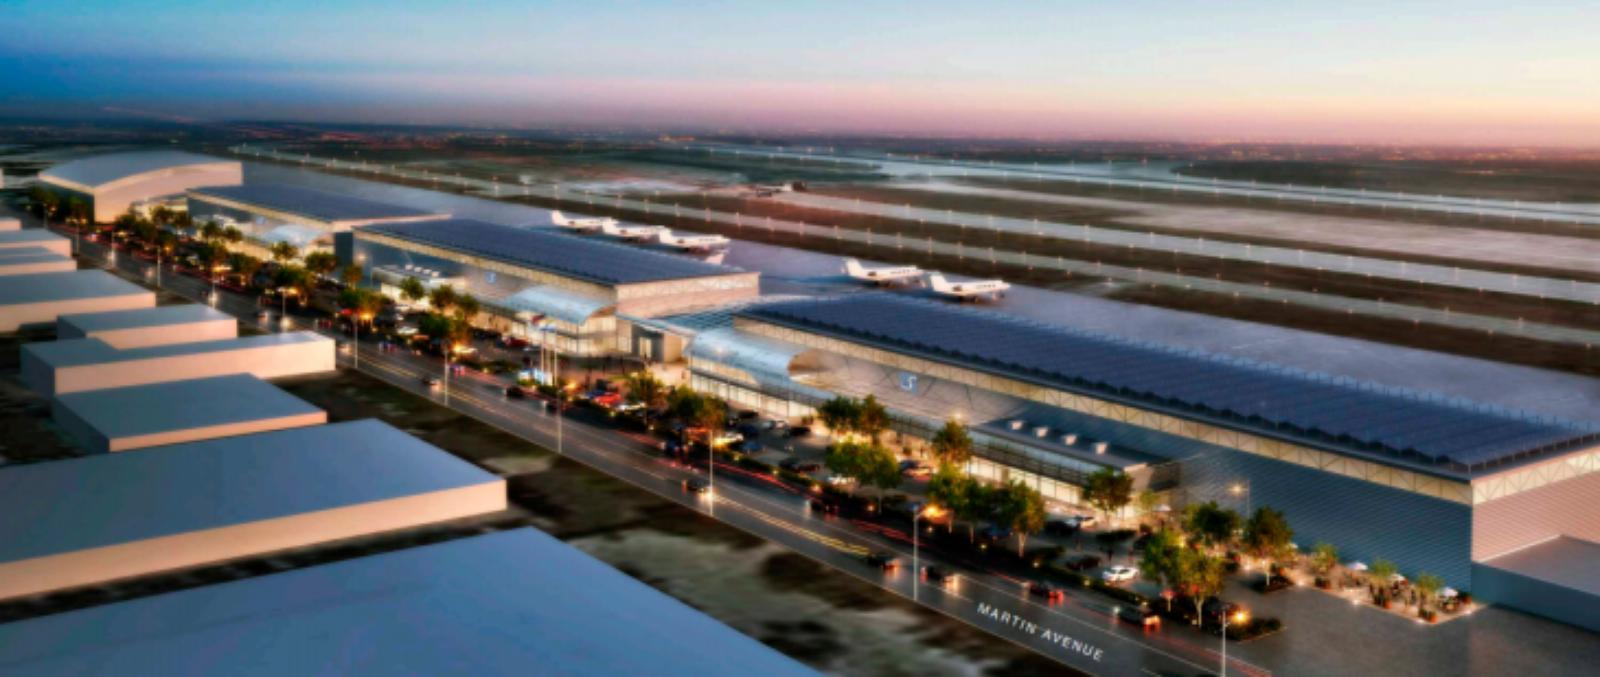 Google's New Hangar at KSJC